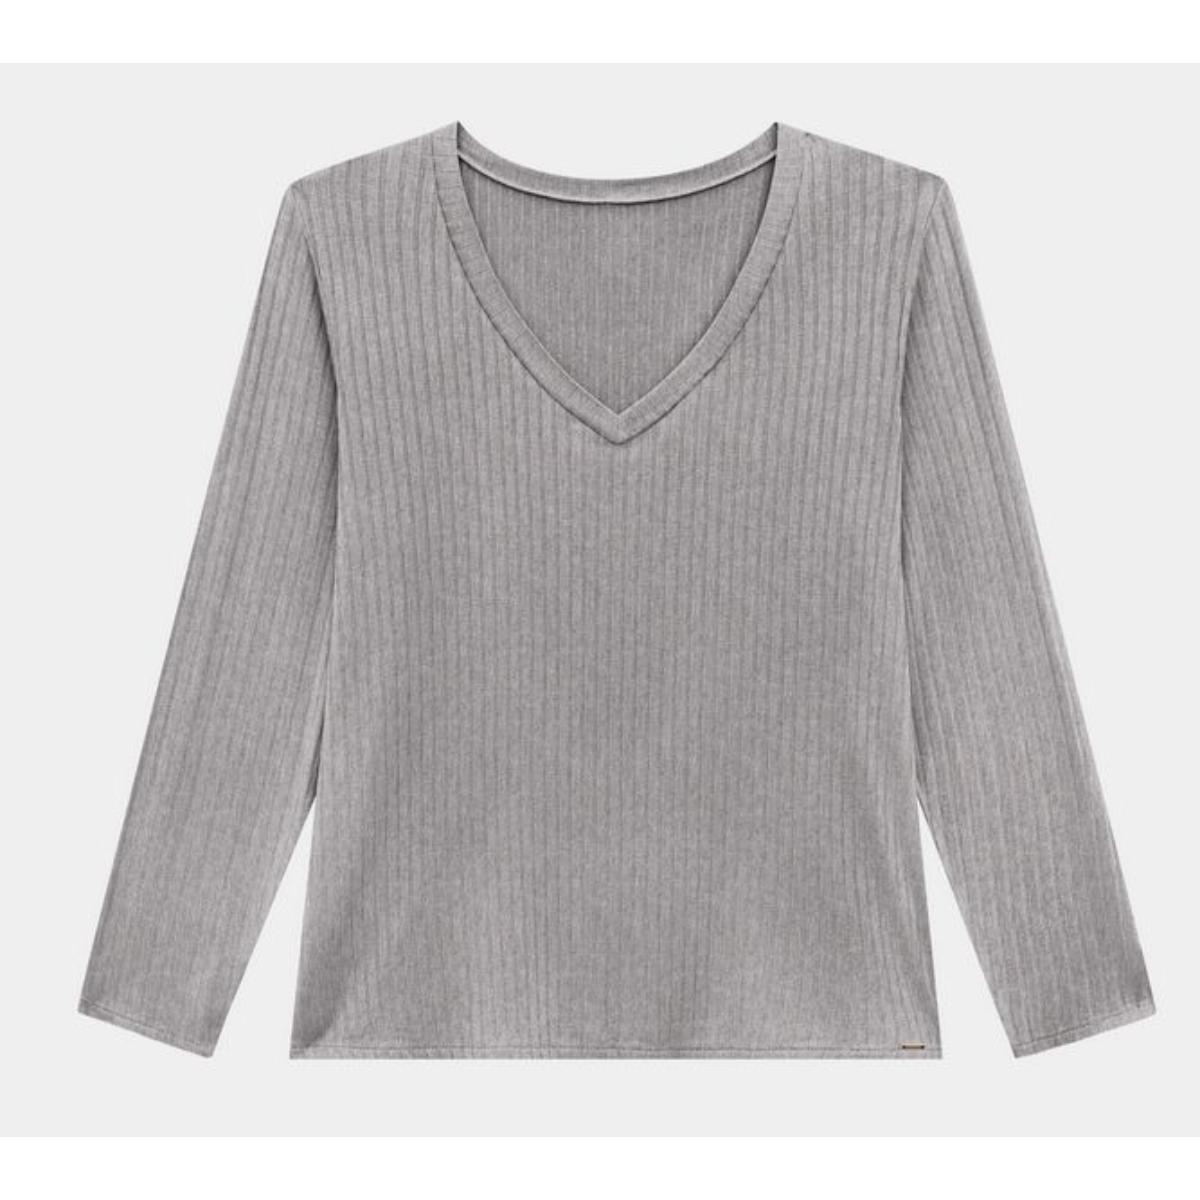 Blusa Feminina Lunender 00450 Mescla